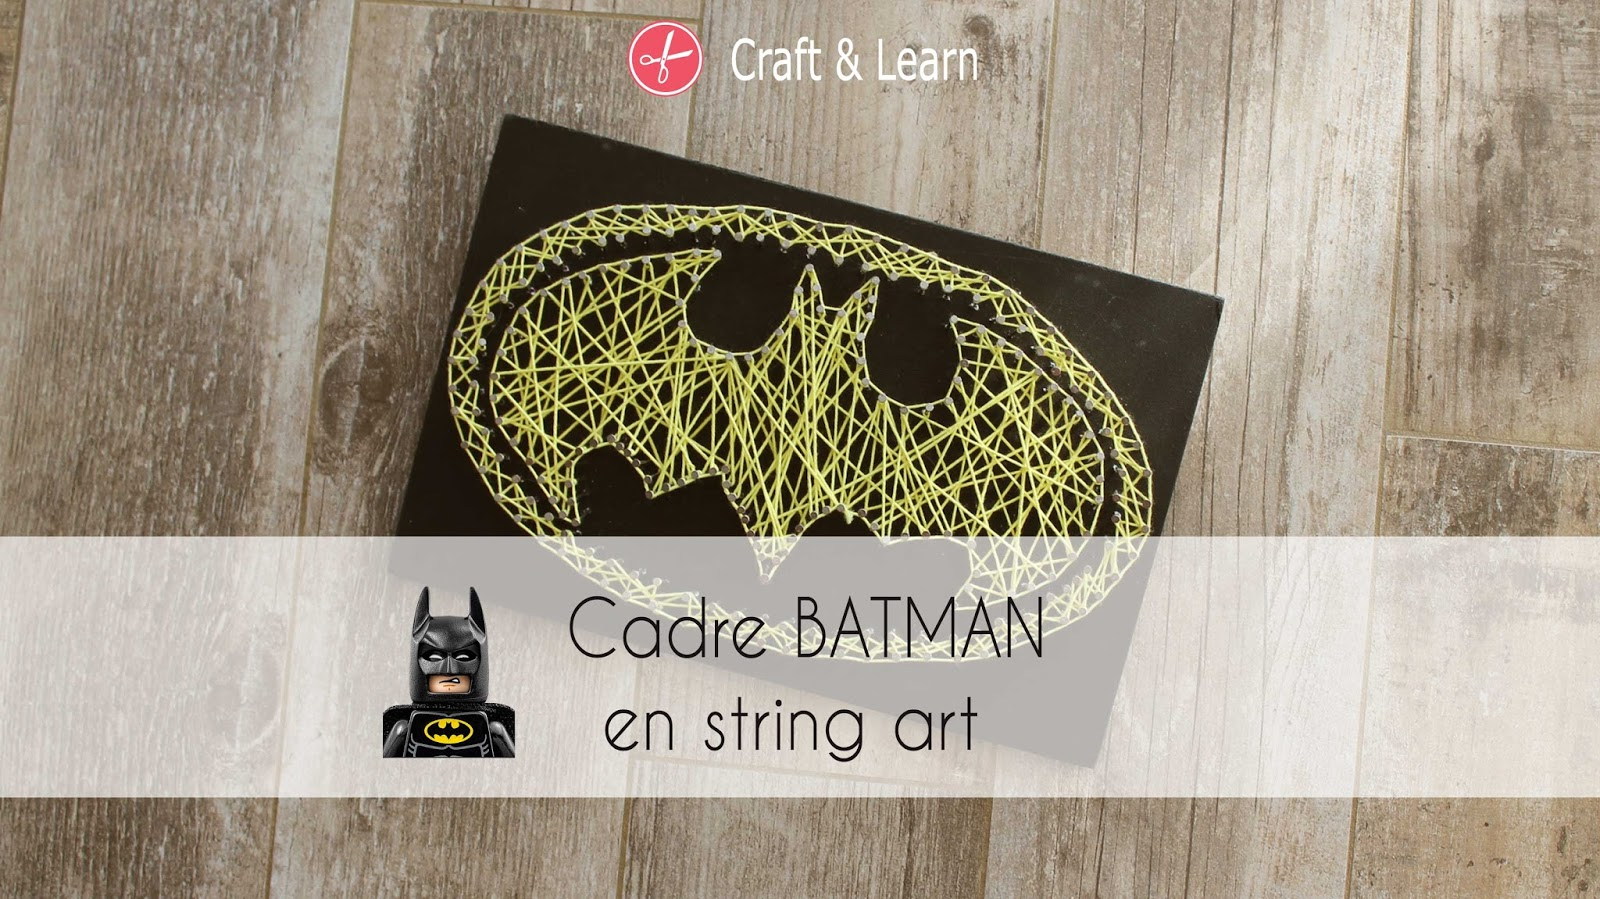 fabriquer un cadre batman en string art high five family. Black Bedroom Furniture Sets. Home Design Ideas